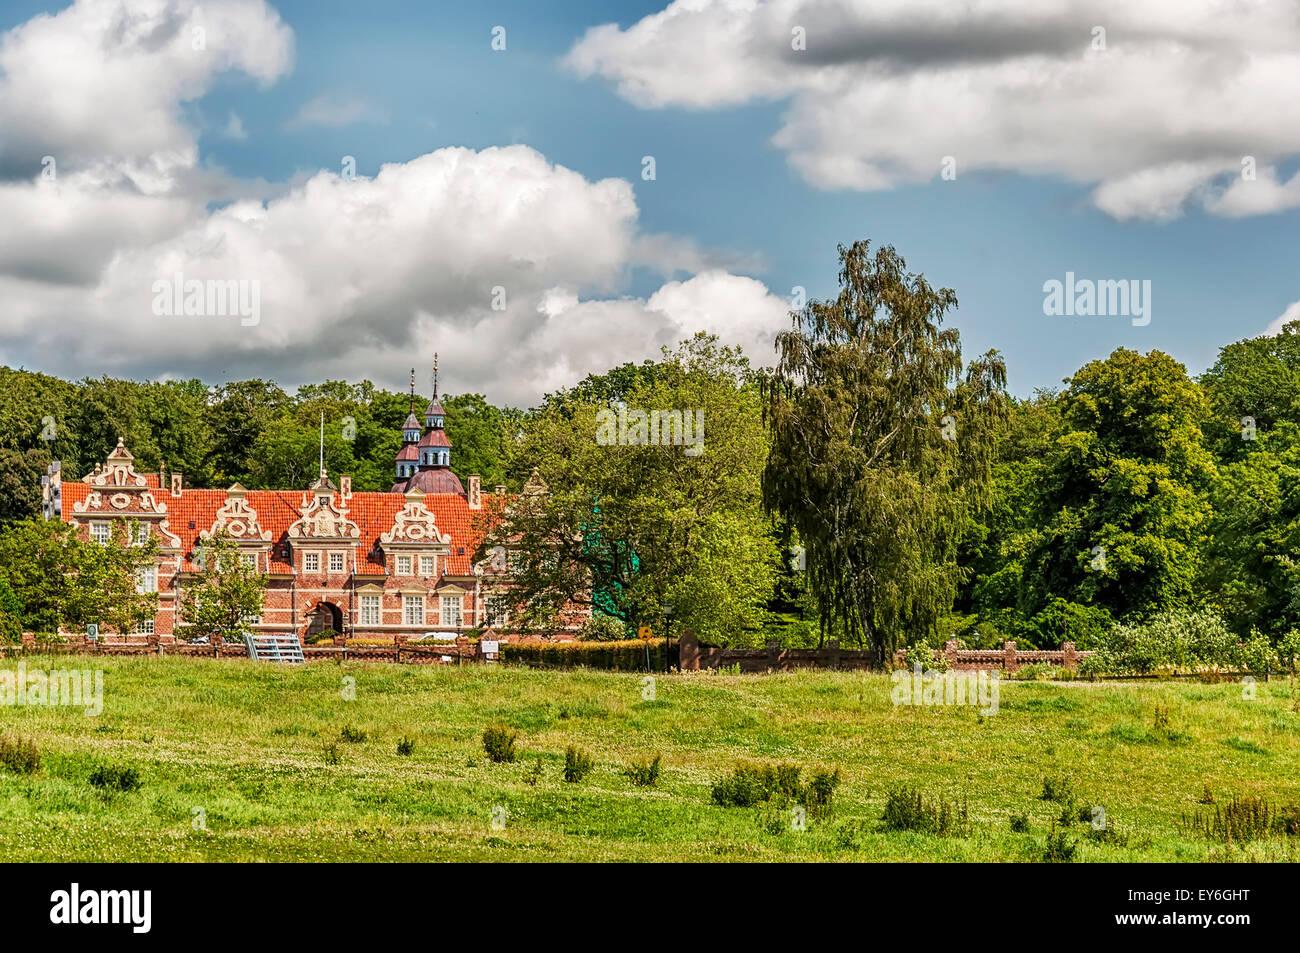 Vrams Gunnarstorp Slott situated in the Skane region of Sweden. - Stock Image